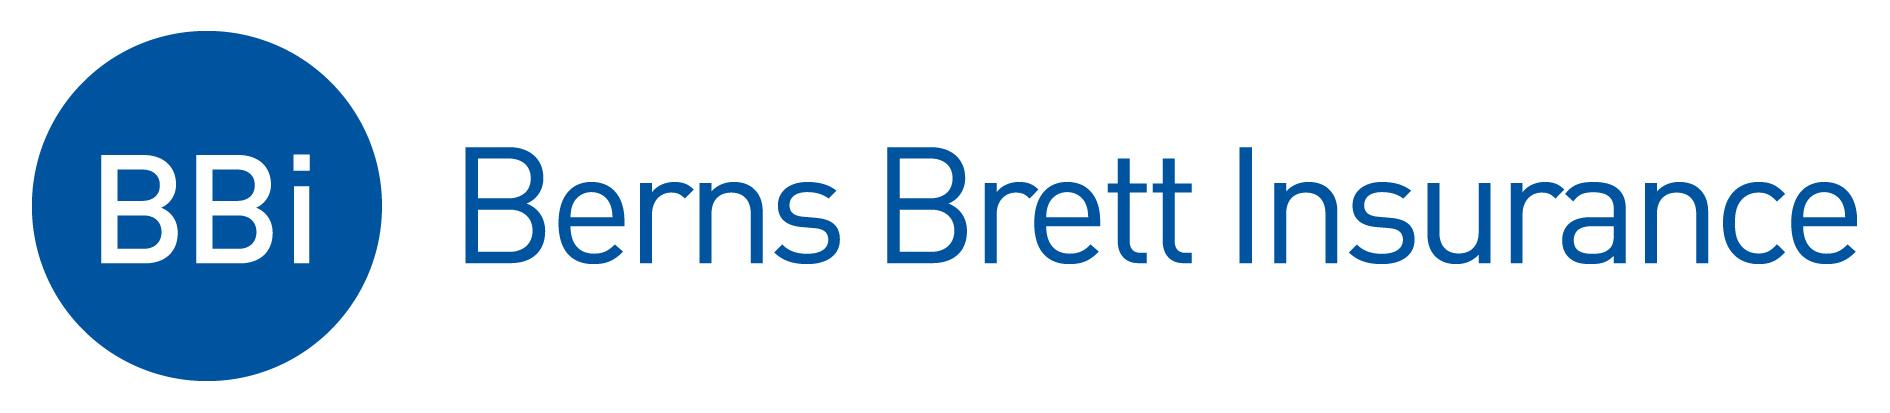 BBi: Expert Insurance & Risk Management Advice